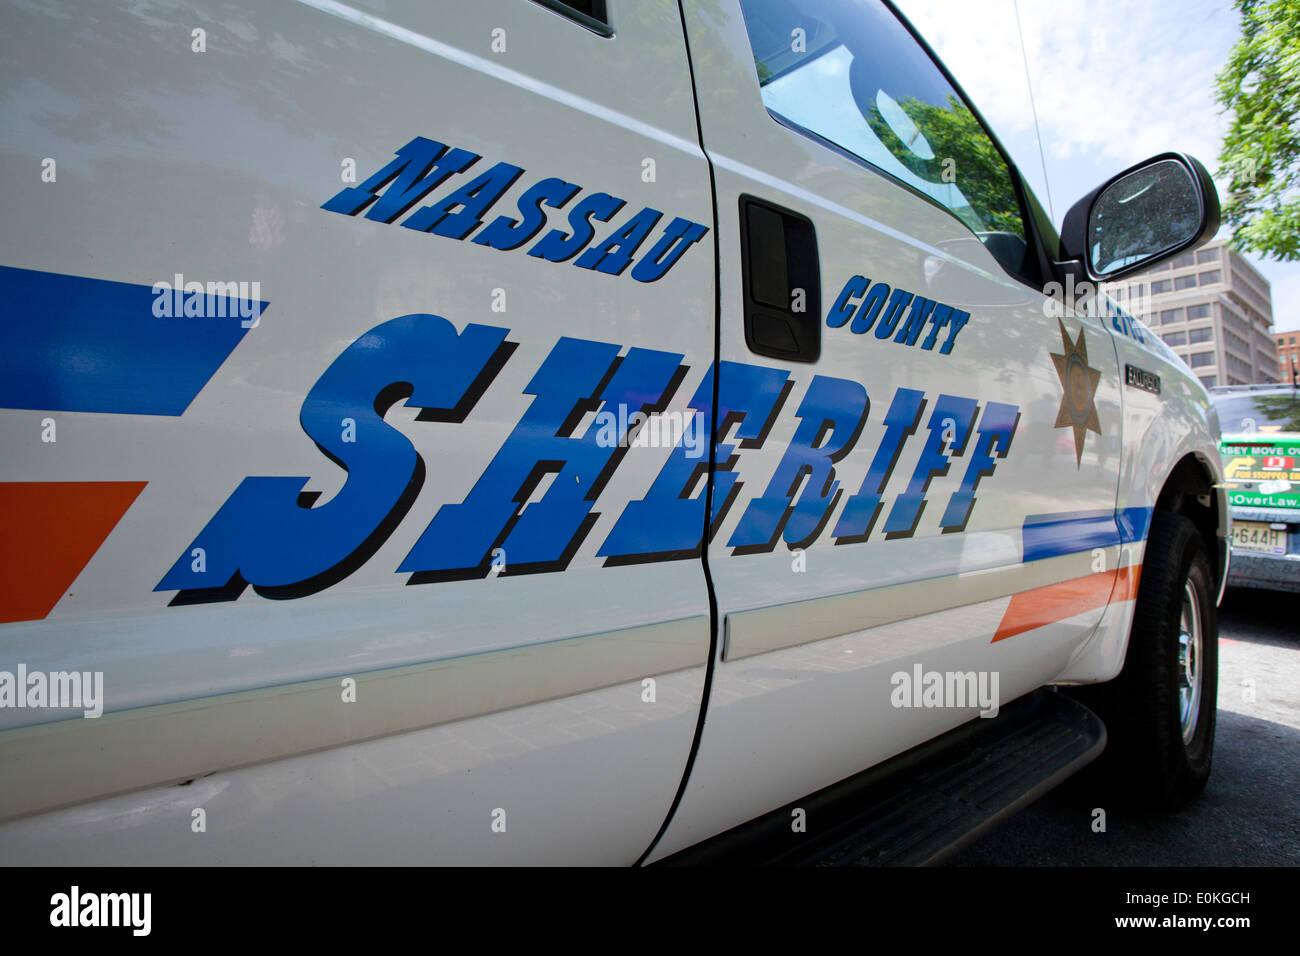 sheriff vehicle stock photos sheriff vehicle stock images alamy. Black Bedroom Furniture Sets. Home Design Ideas